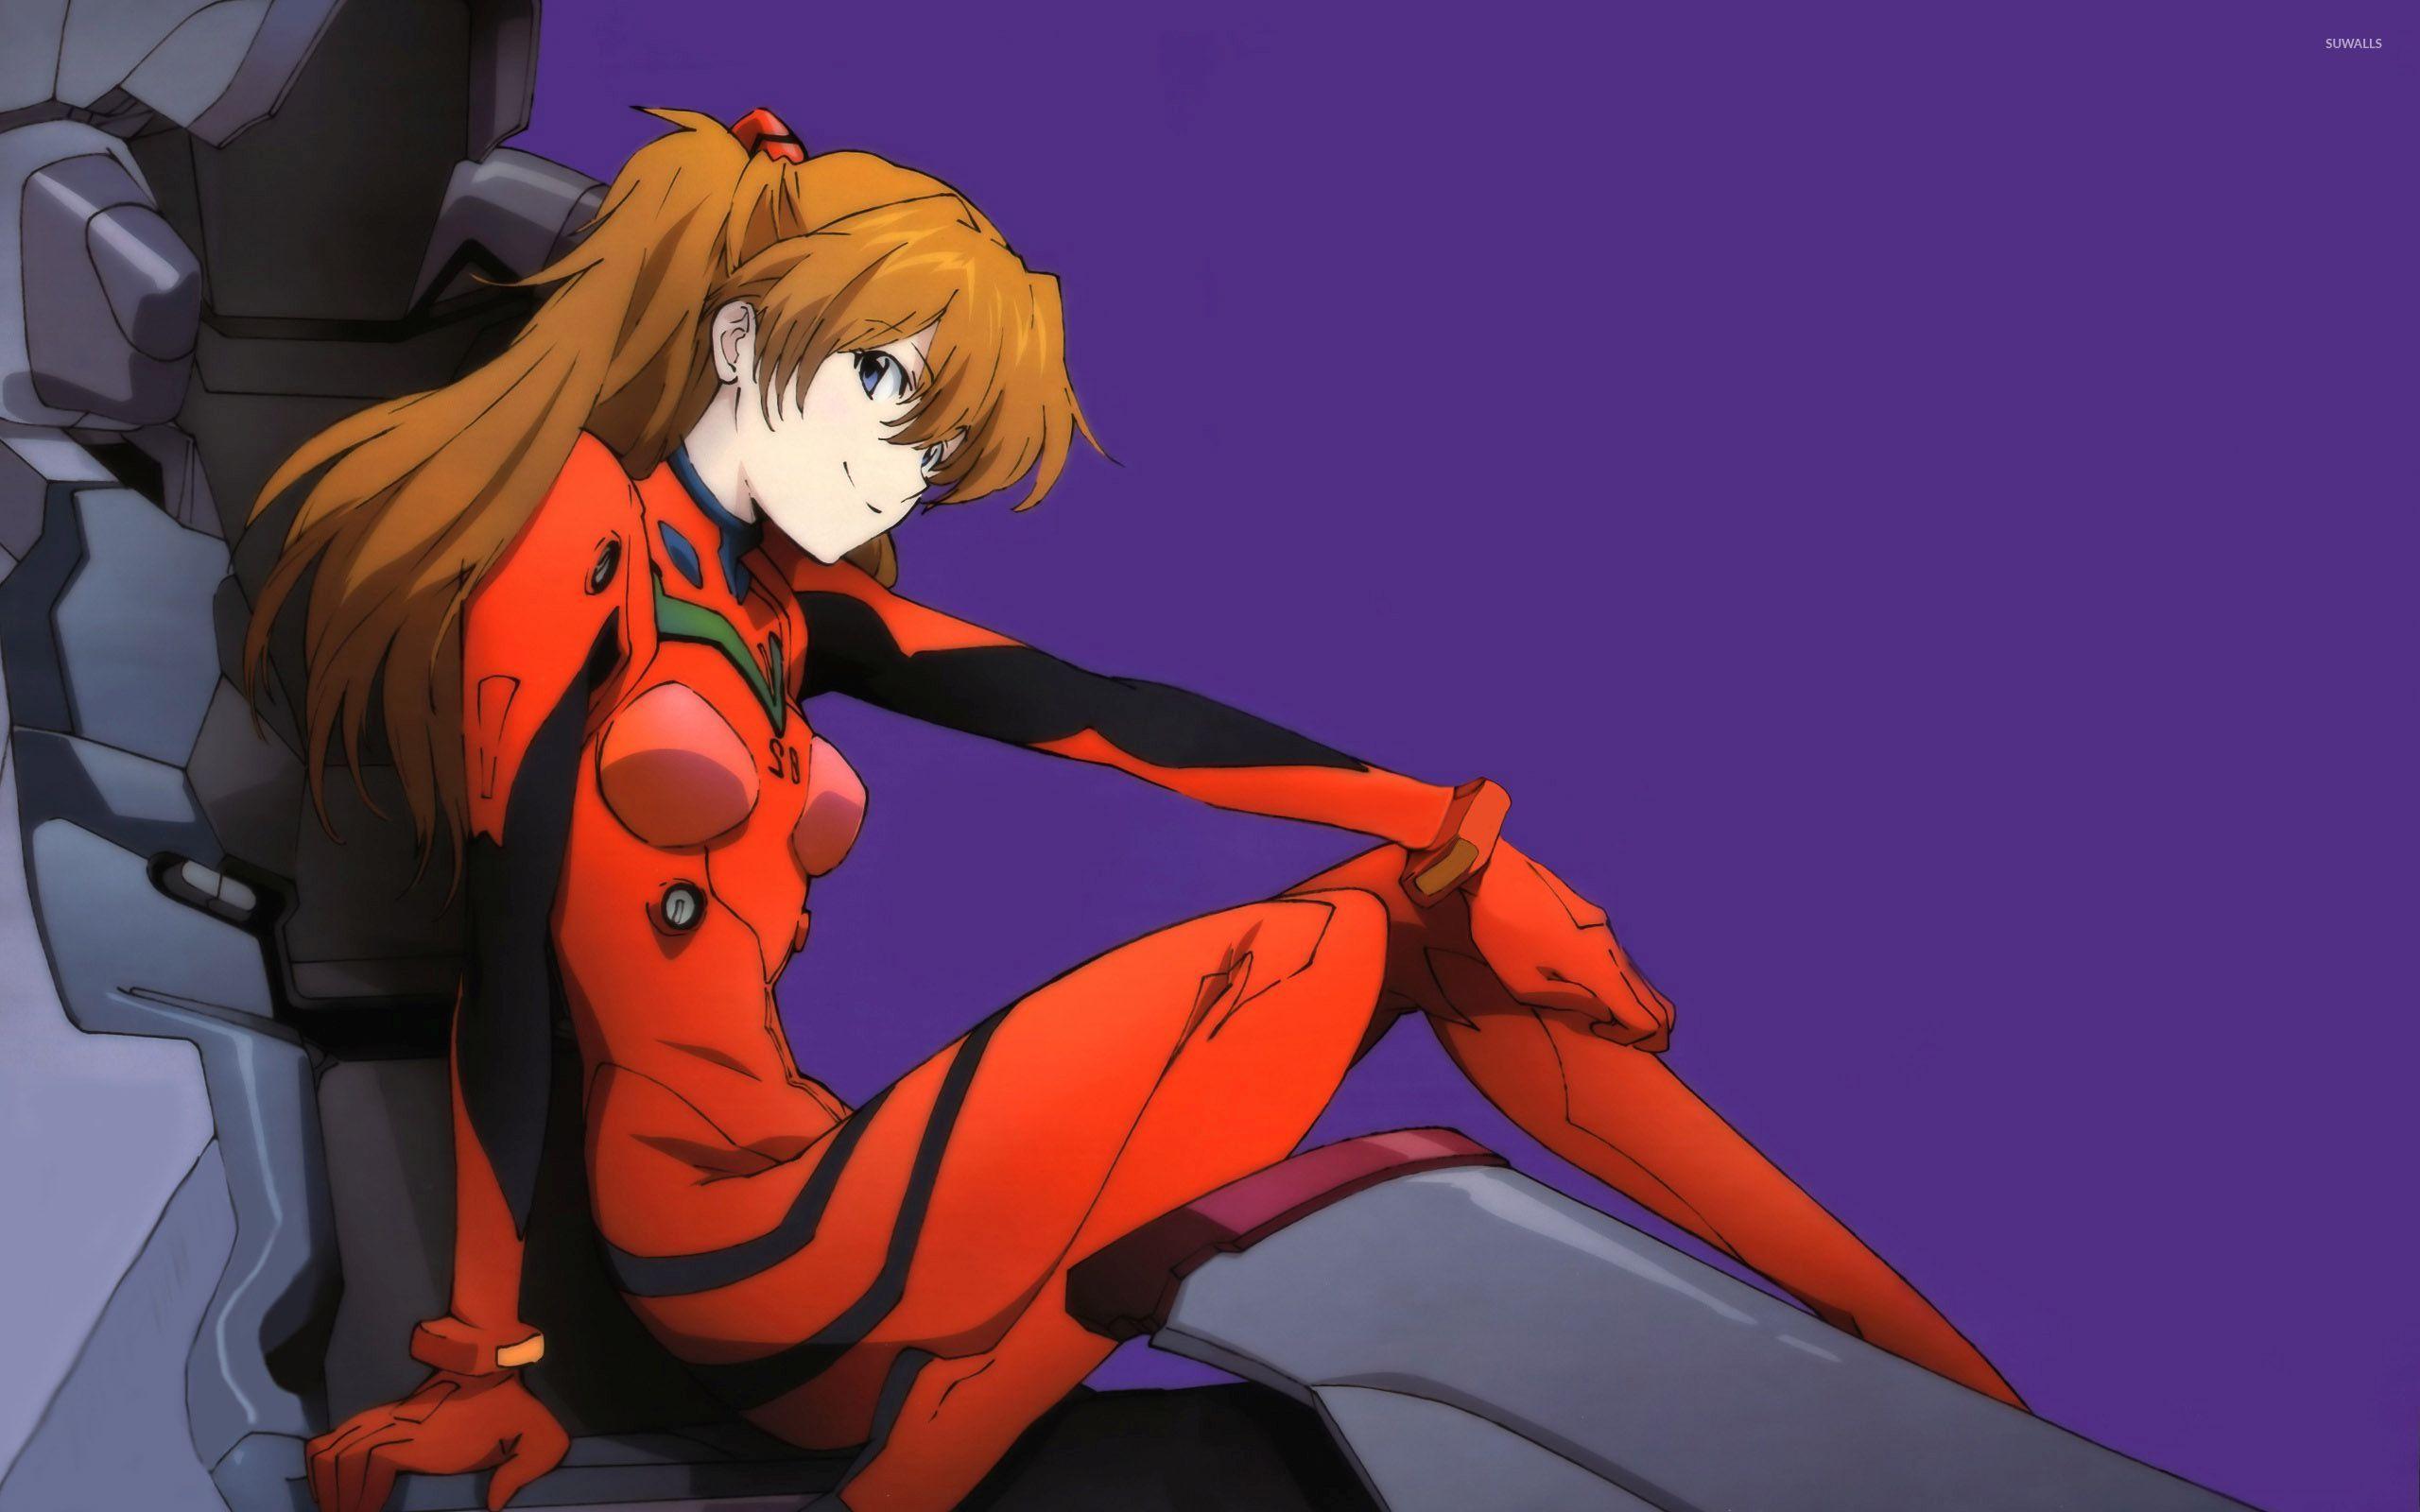 asuka langley soryu - neon genesis evangelion [6] wallpaper - anime